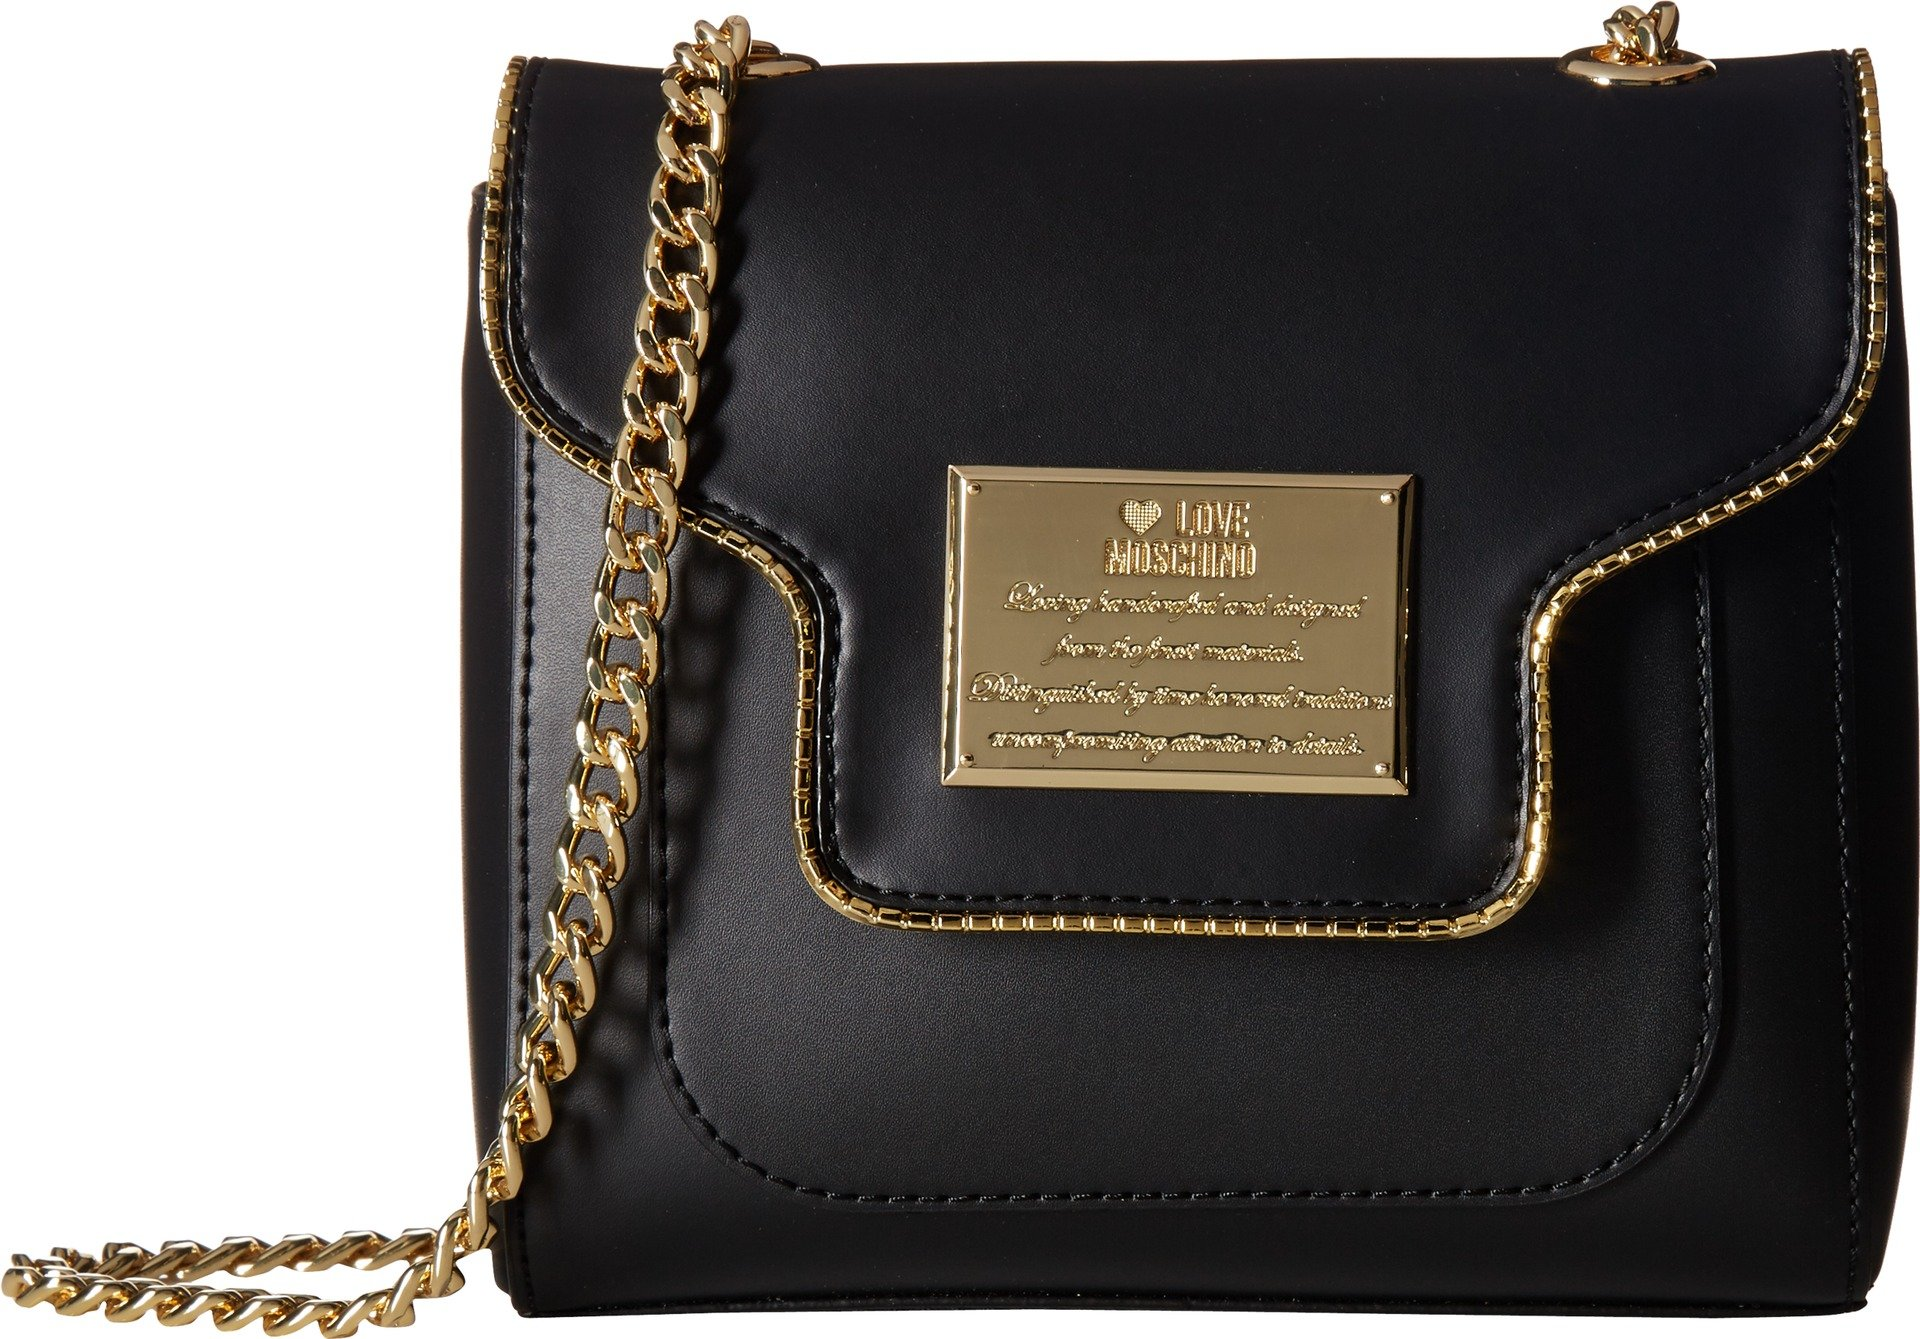 LOVE Moschino Women's Plaque Flap Crossbody Black Crossbody Bag